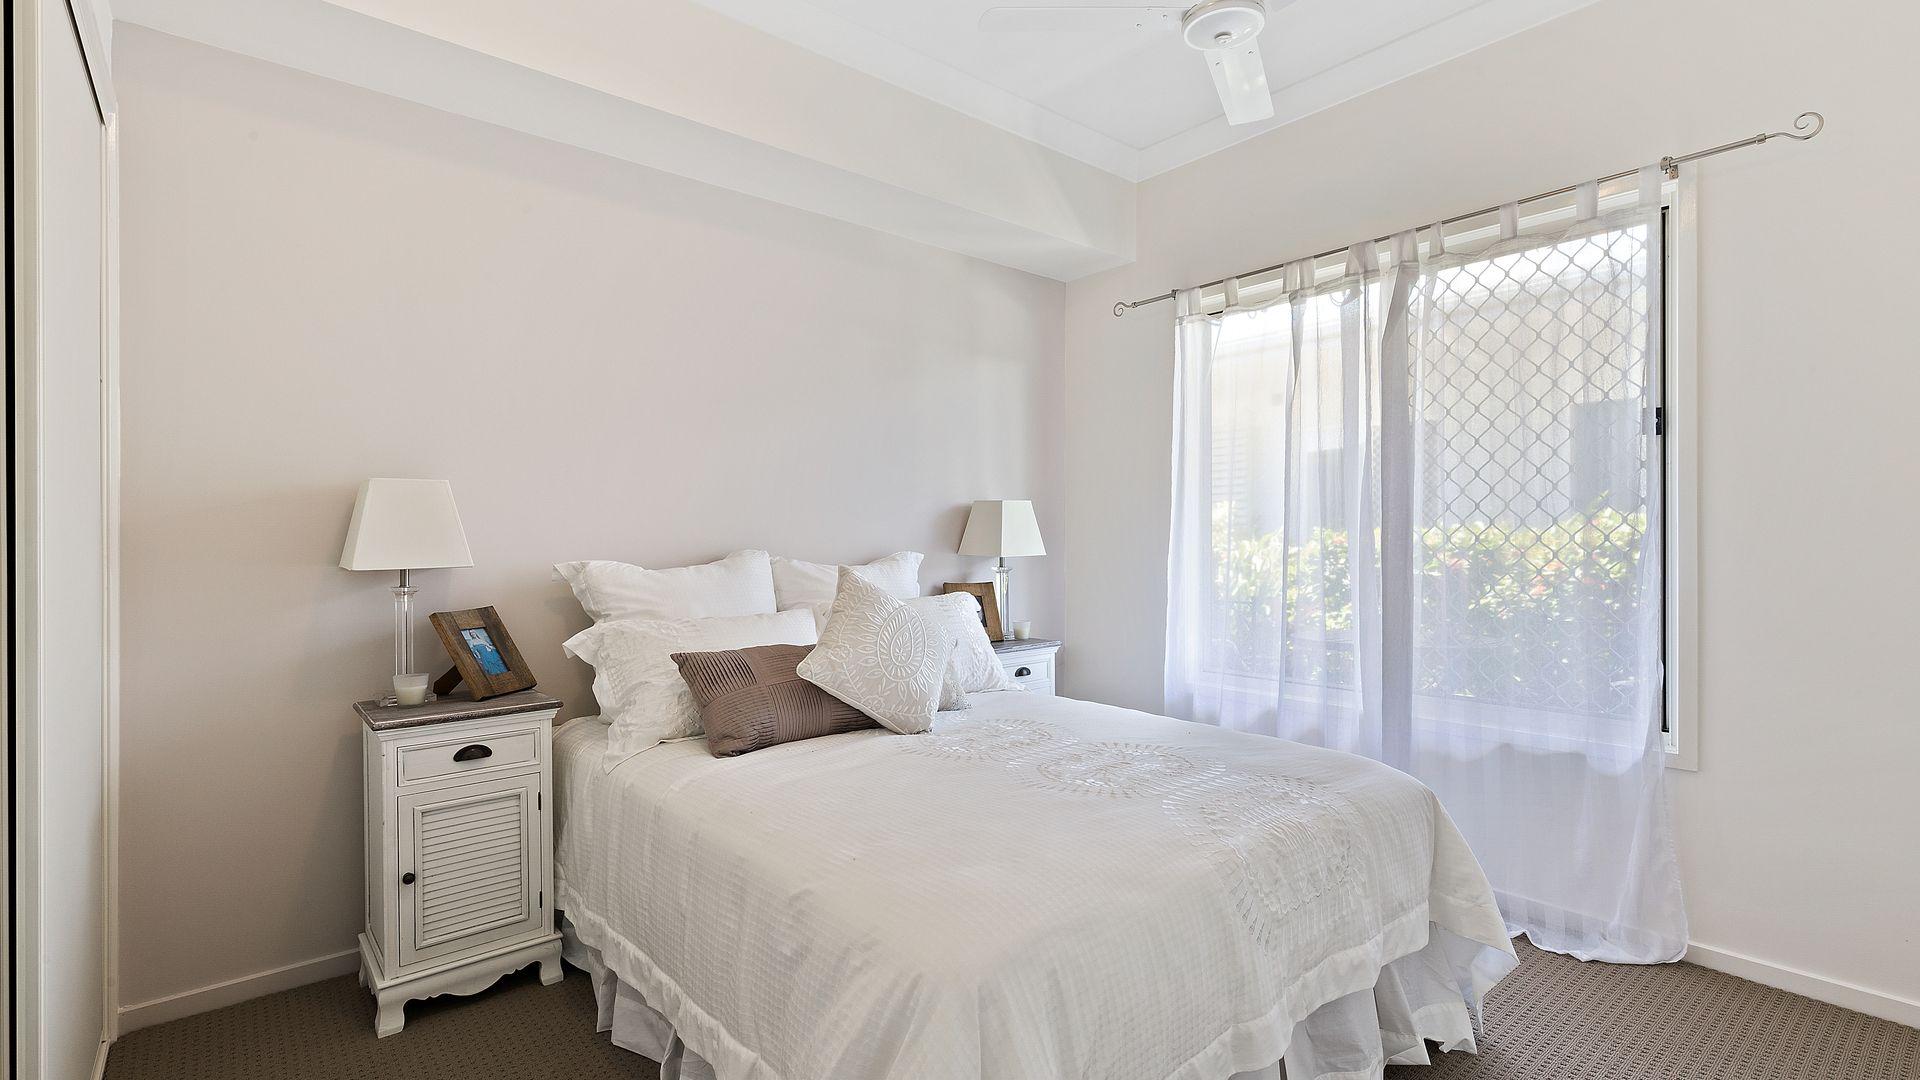 8/14 Pauline Martin Drive, Rockhampton City QLD 4700, Image 1